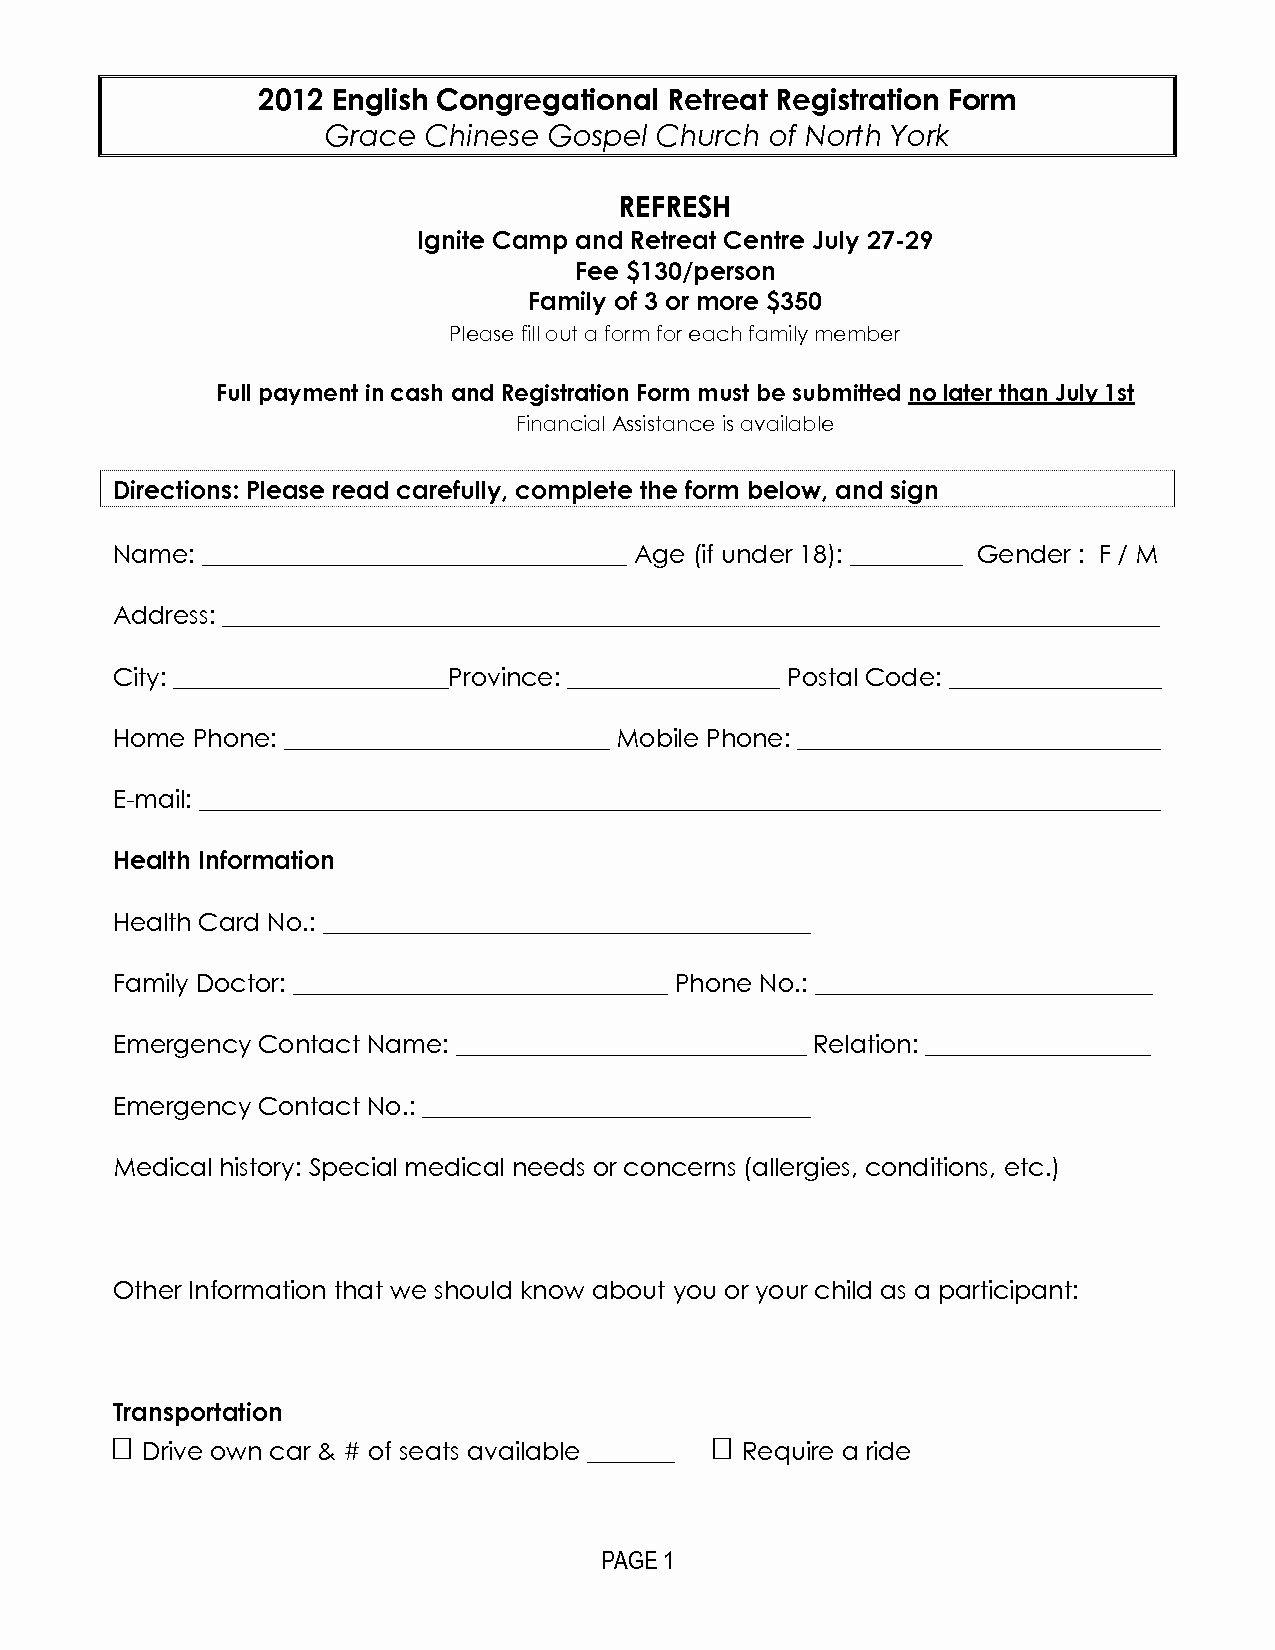 Camp Registration Form Template Word Fresh Retreat Registration Forms Registration Form Registration Form Sample Event Registration